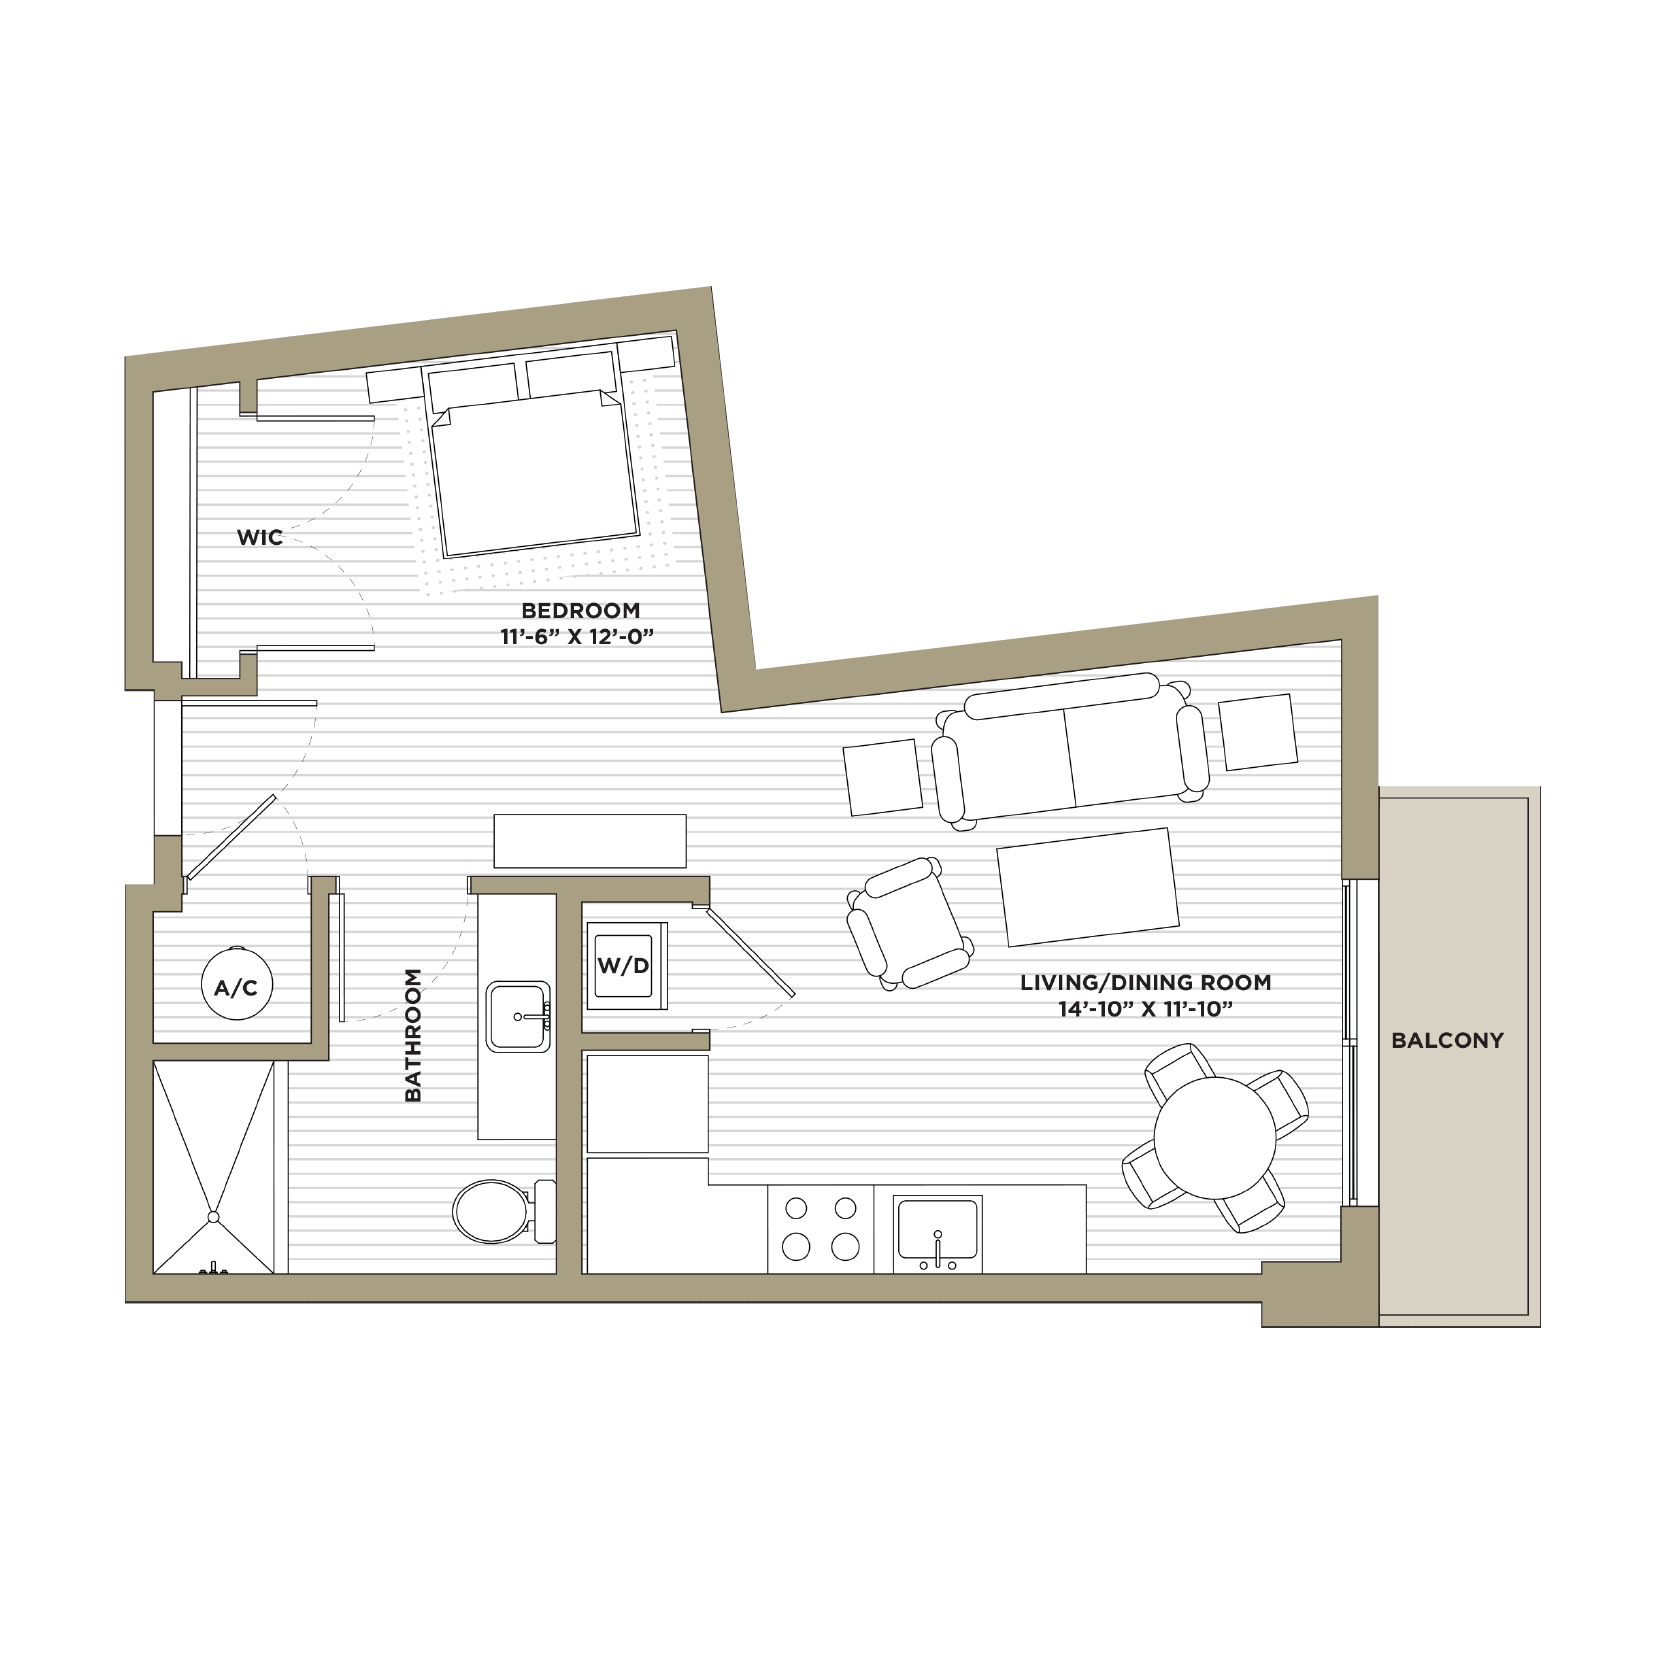 S2 - Studio / 1 Bathroom548 sq. ft.